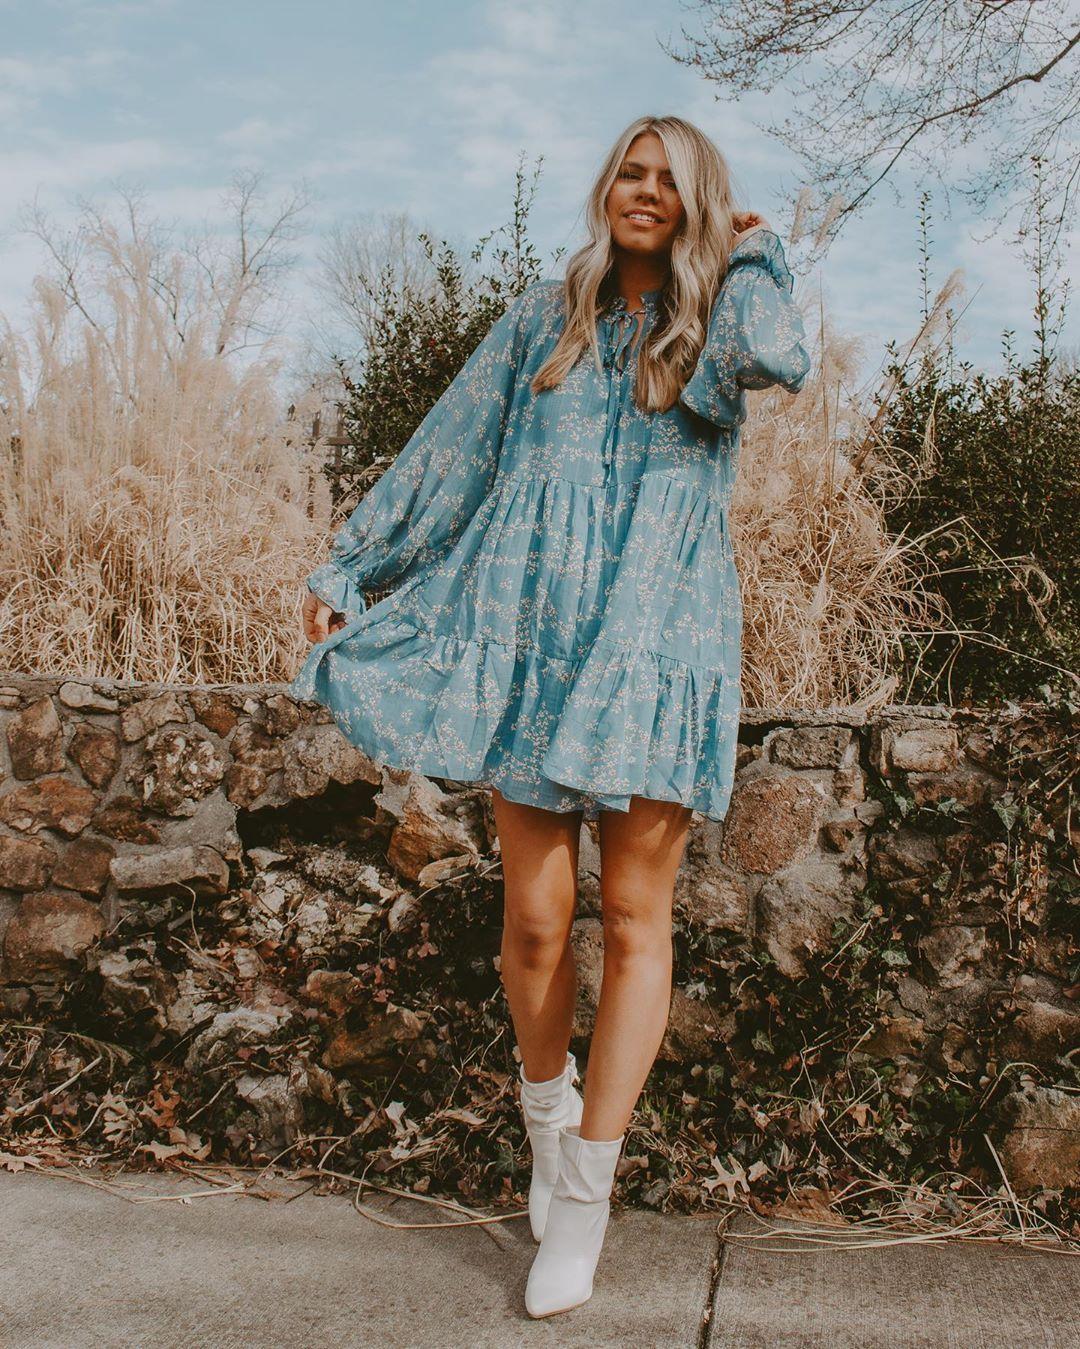 Romantic Type Slate Blue Floral Print Tiered Babydoll Dress Carefree Fashion Fashion Long Sleeve Babydoll Dress [ 1349 x 1080 Pixel ]